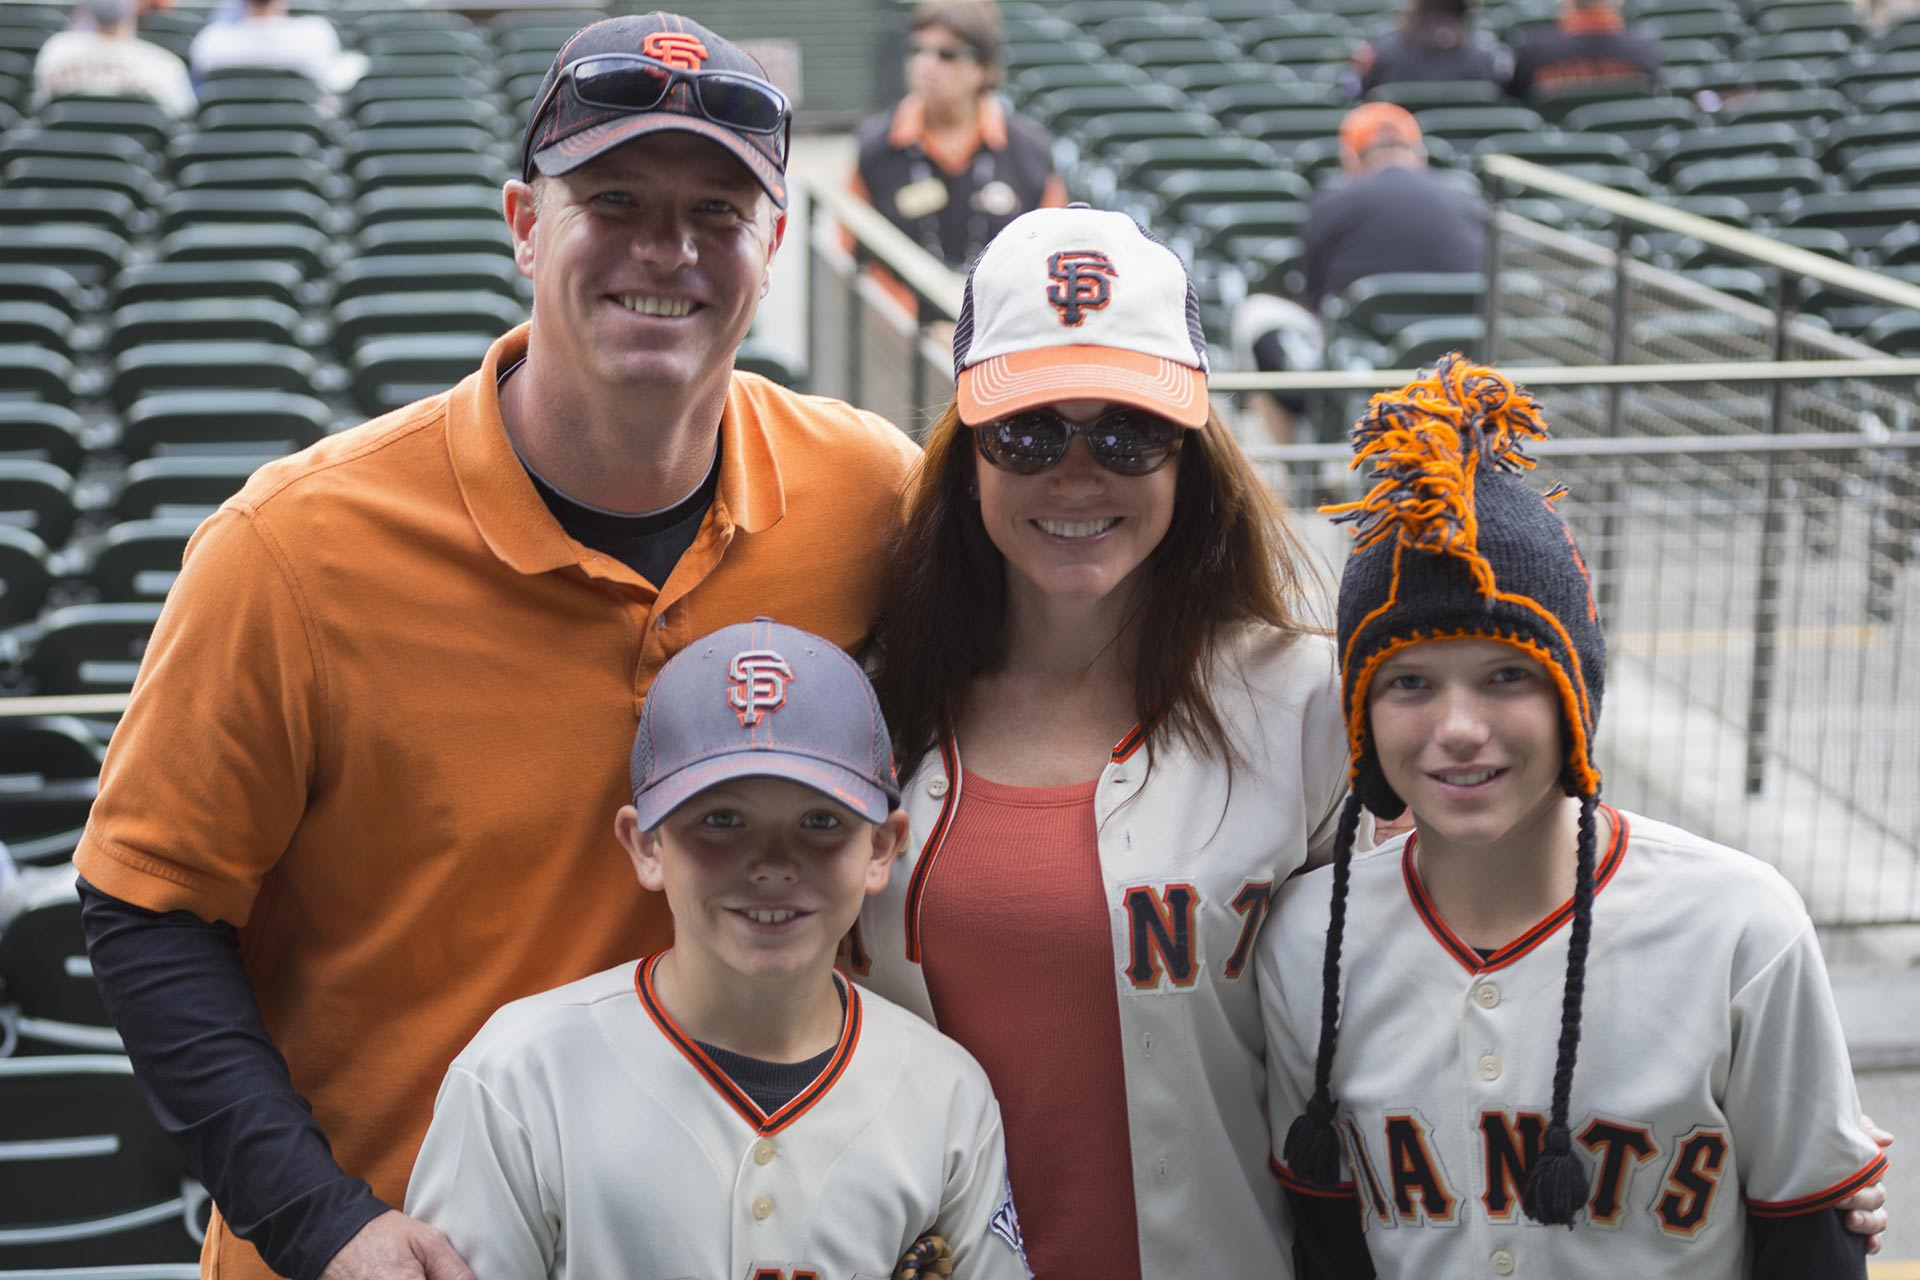 A family at a baseball game in San Francisco, California.